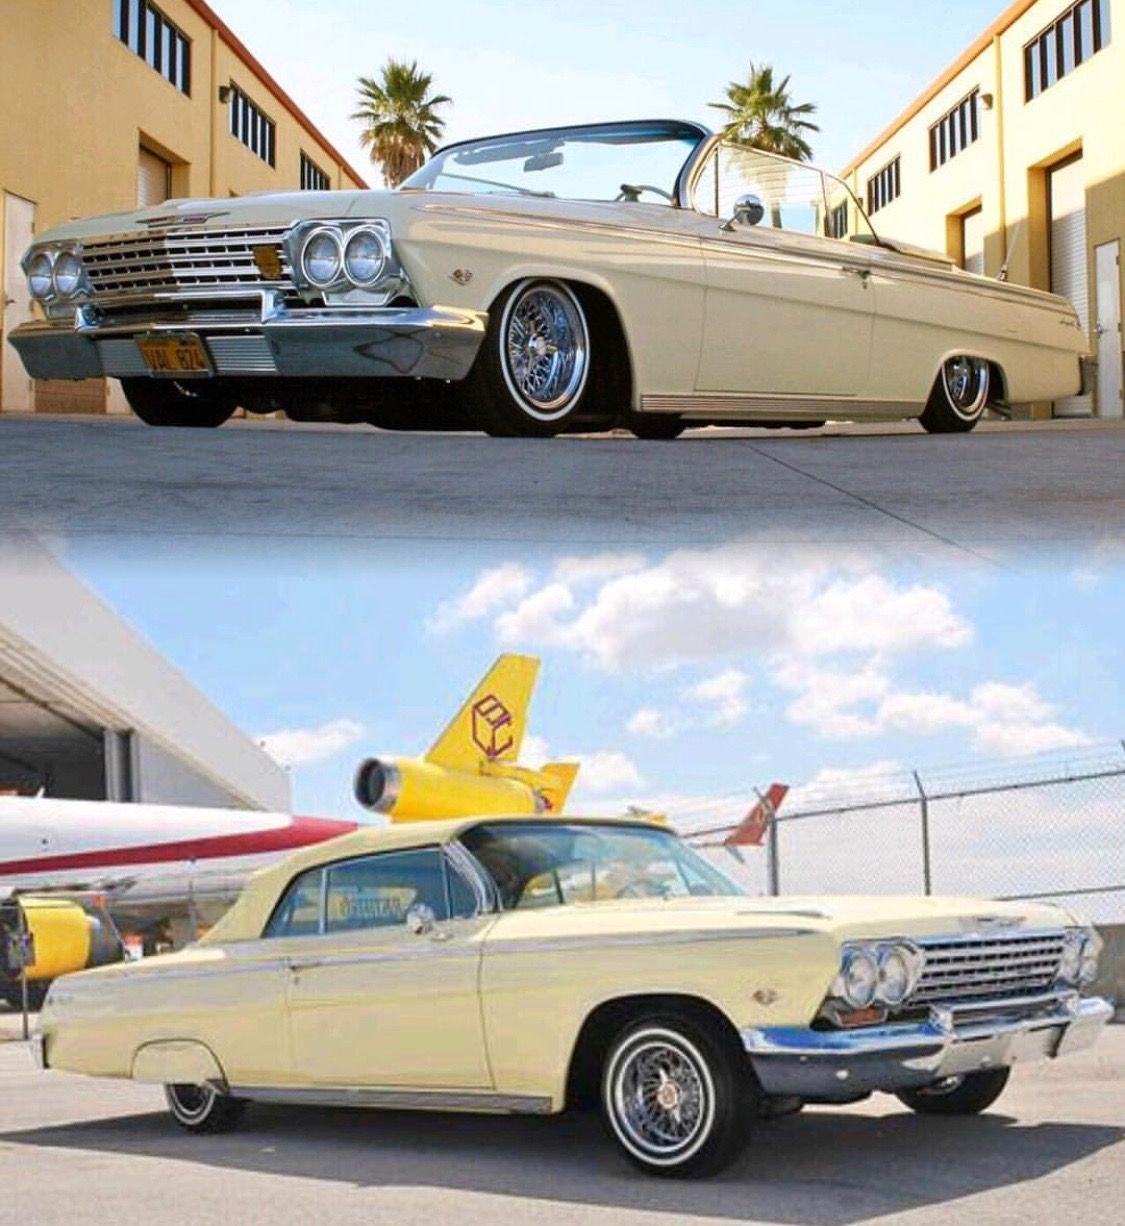 62 Impala Drop Top Lowrider